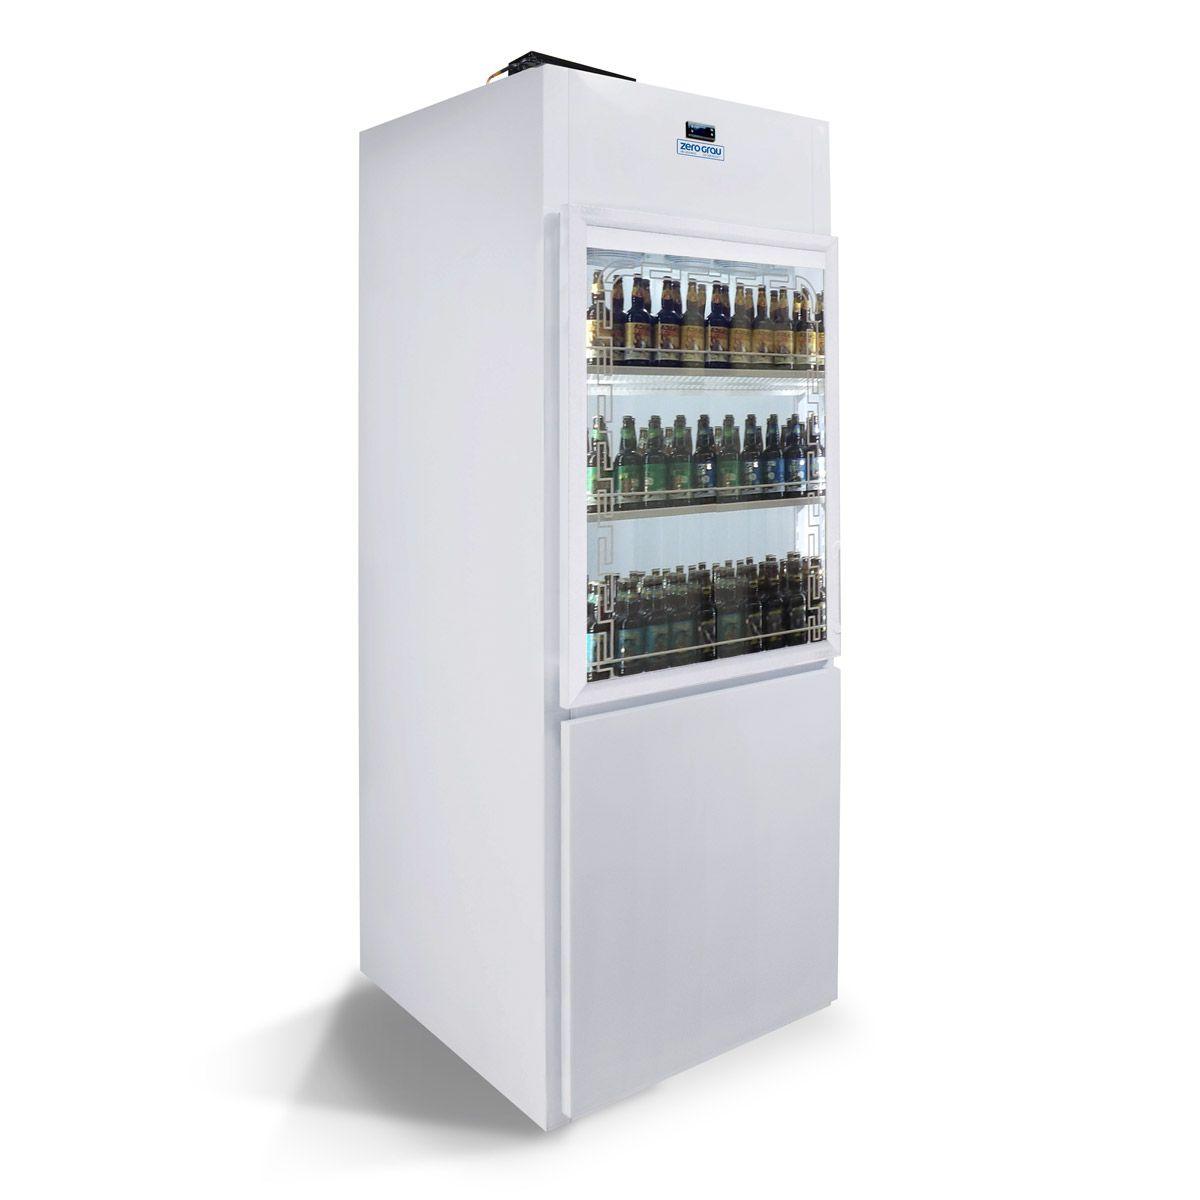 Refrigerador 2 Portas 950 Litros Visocooler